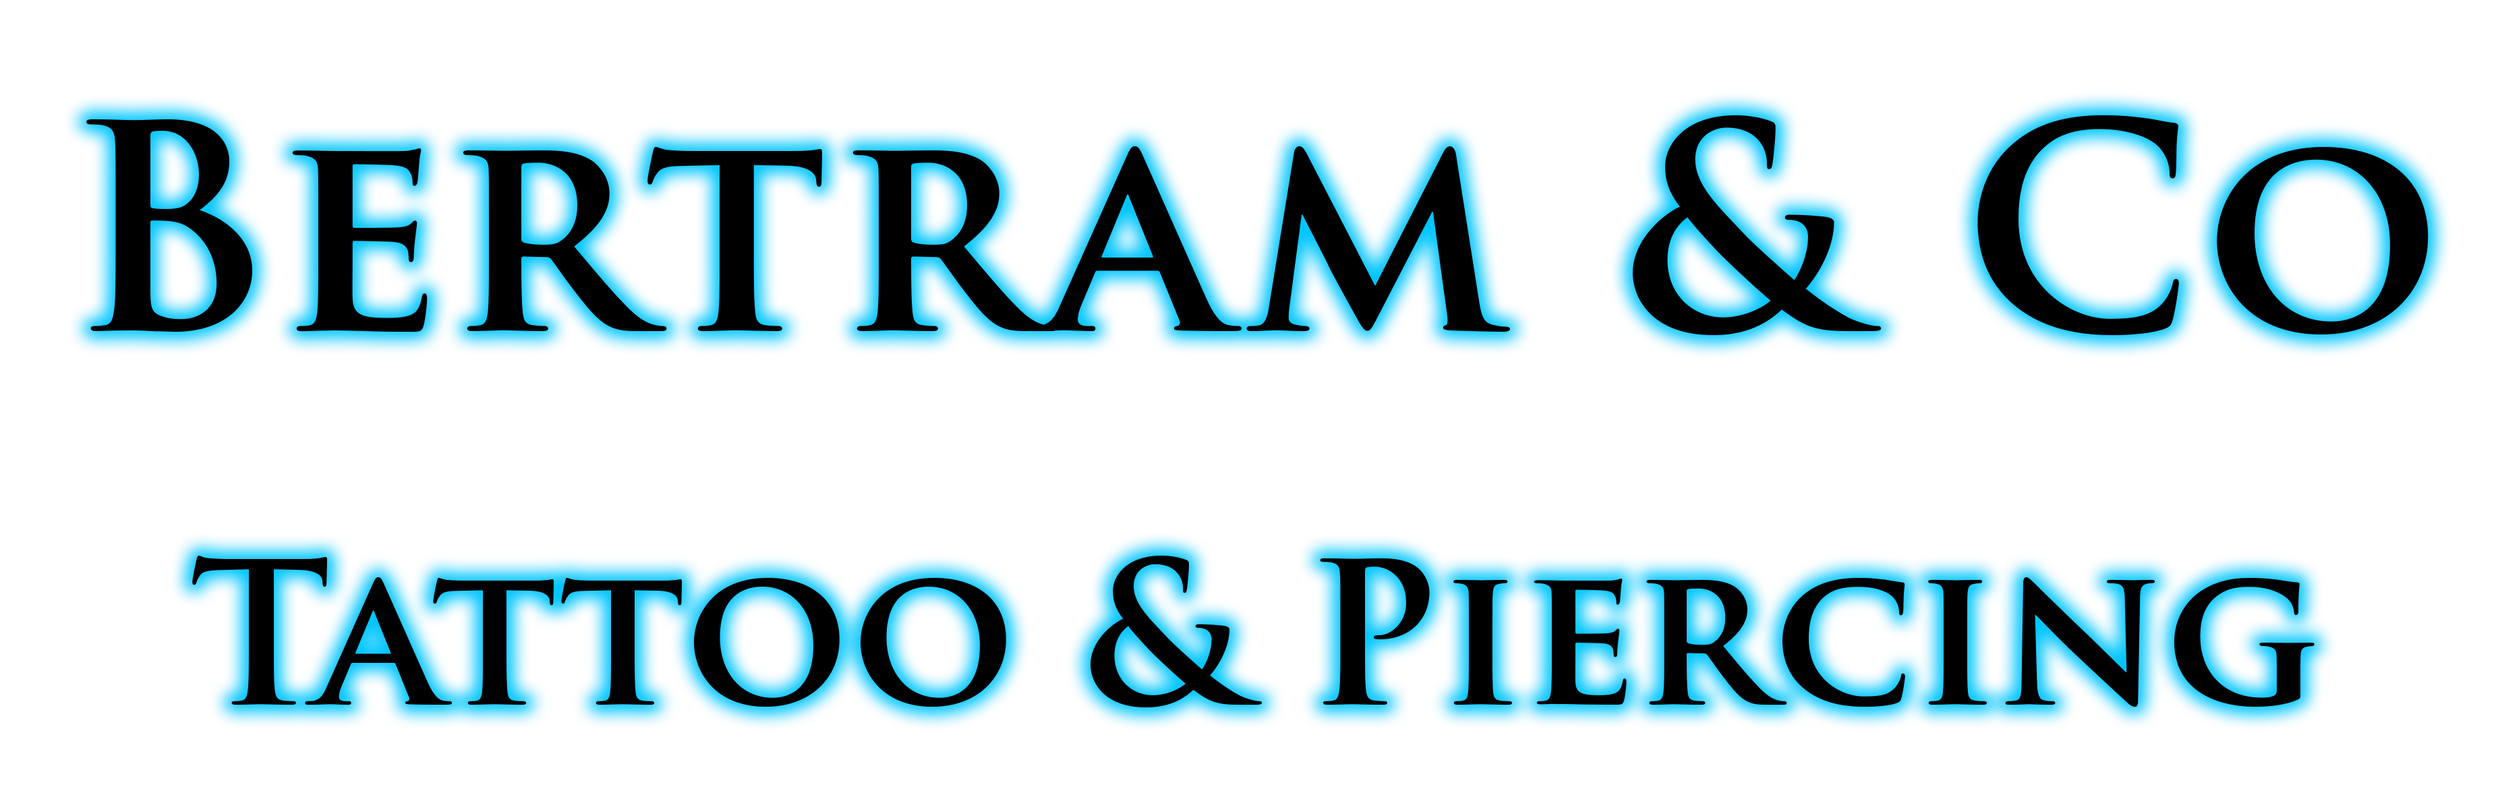 Bertram & Co Tattoo & Piercing logo